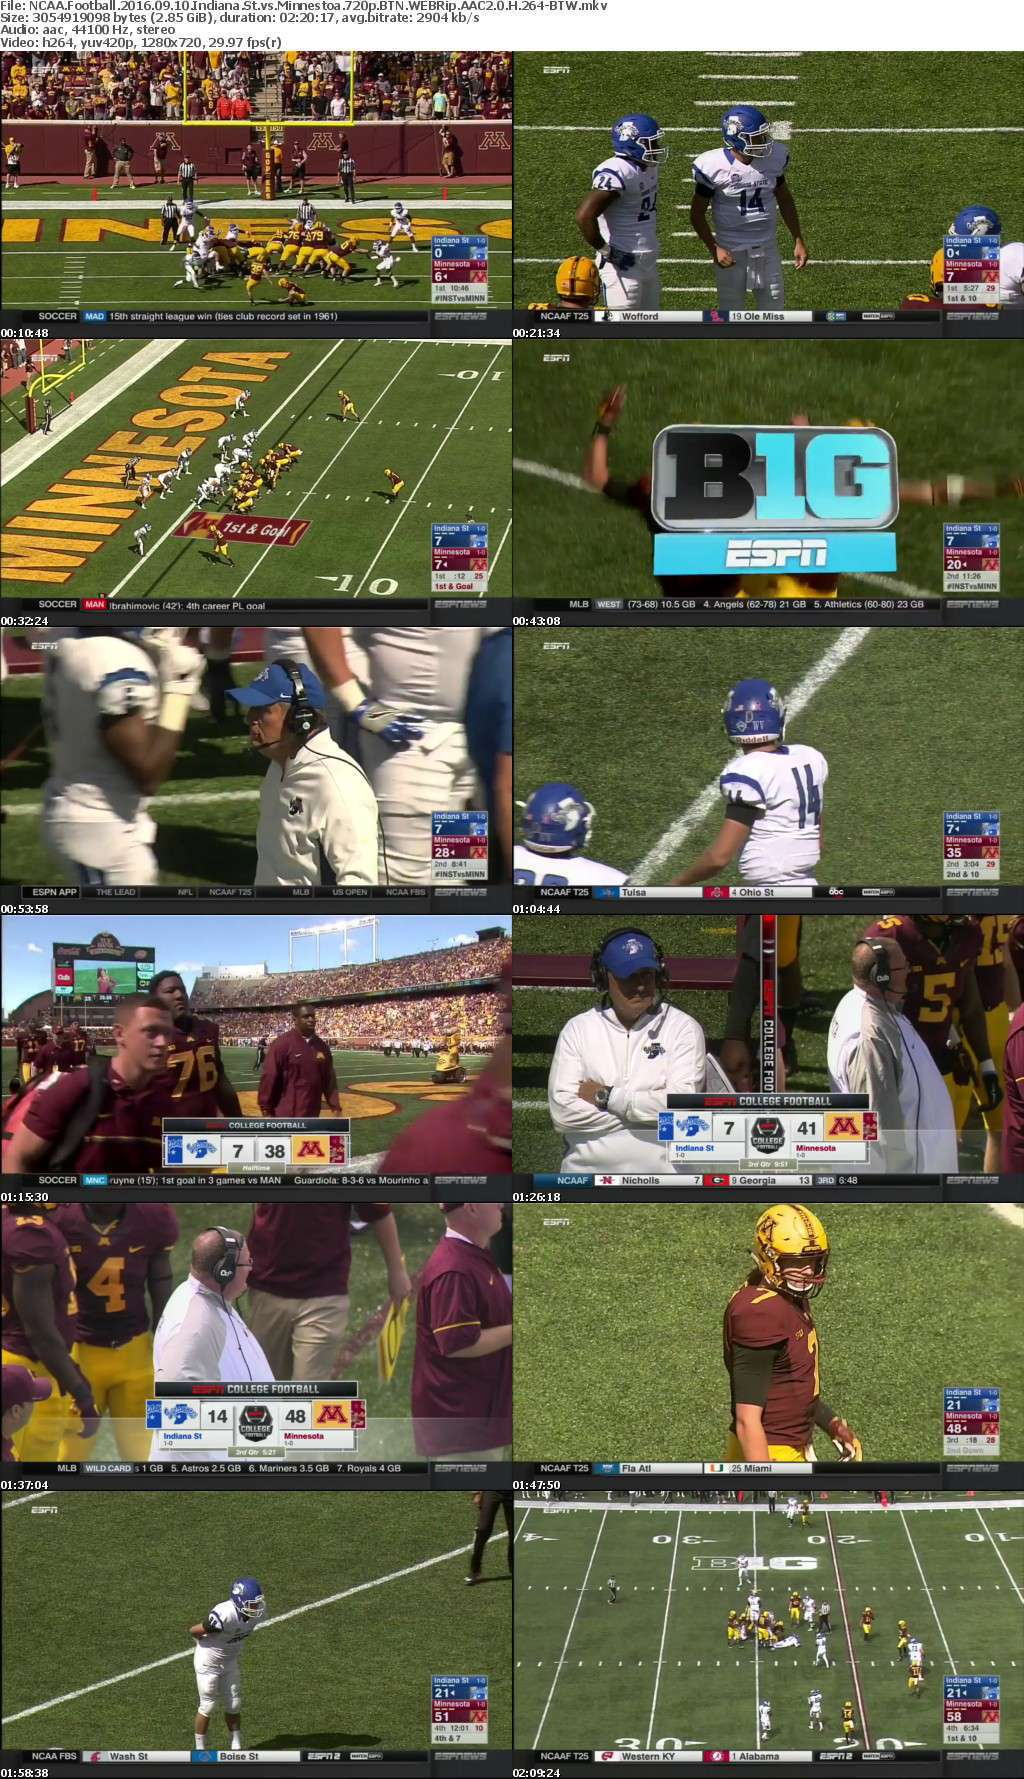 NCAA Football 2016 09 10 Indiana St vs Minnestoa 720p BTN WEBRip AAC2 0 H 264-BTW